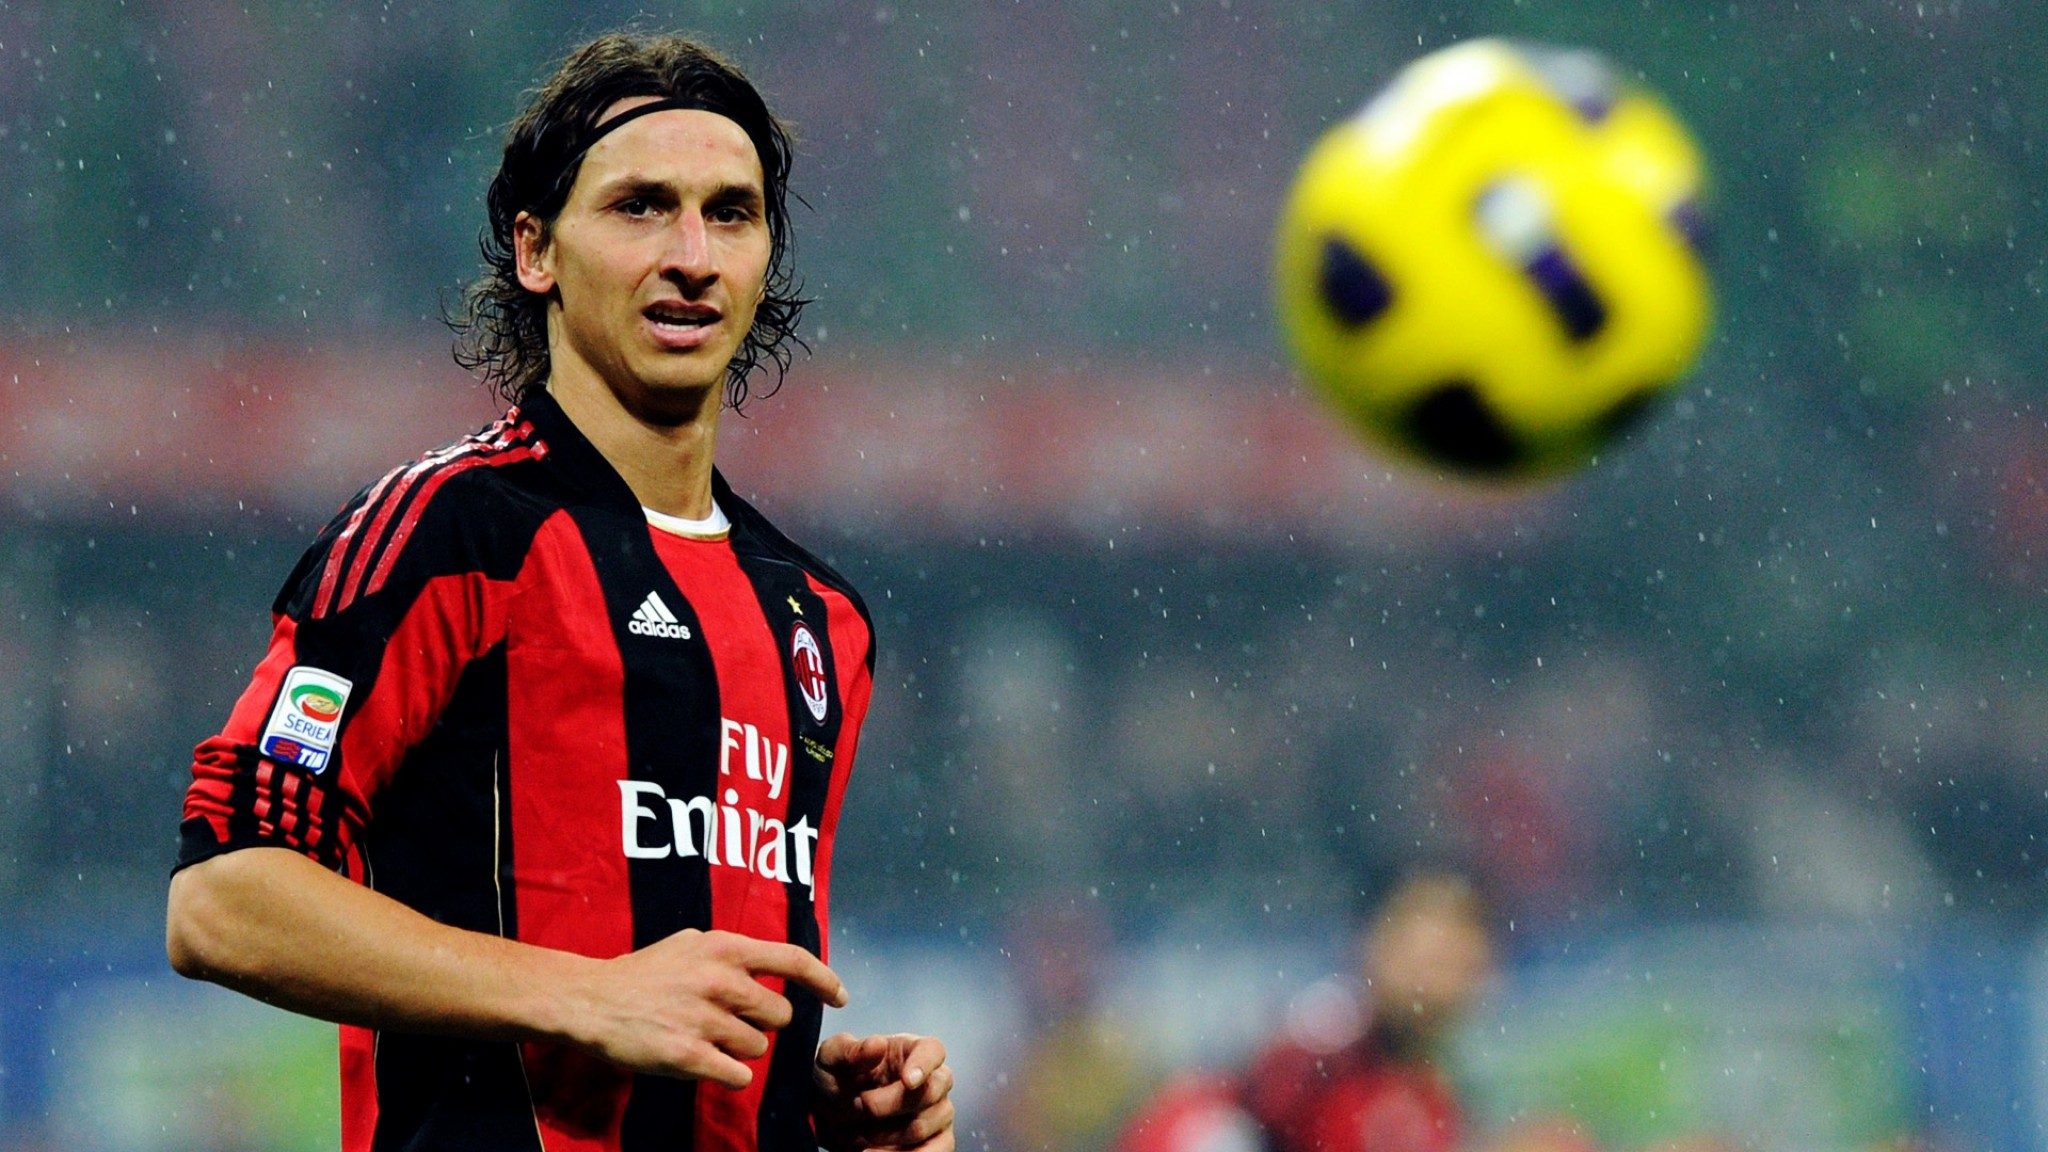 Milan  Zlatan Ibrahimovic  Football Player  Football  Rain  Ball HD Wallpaper